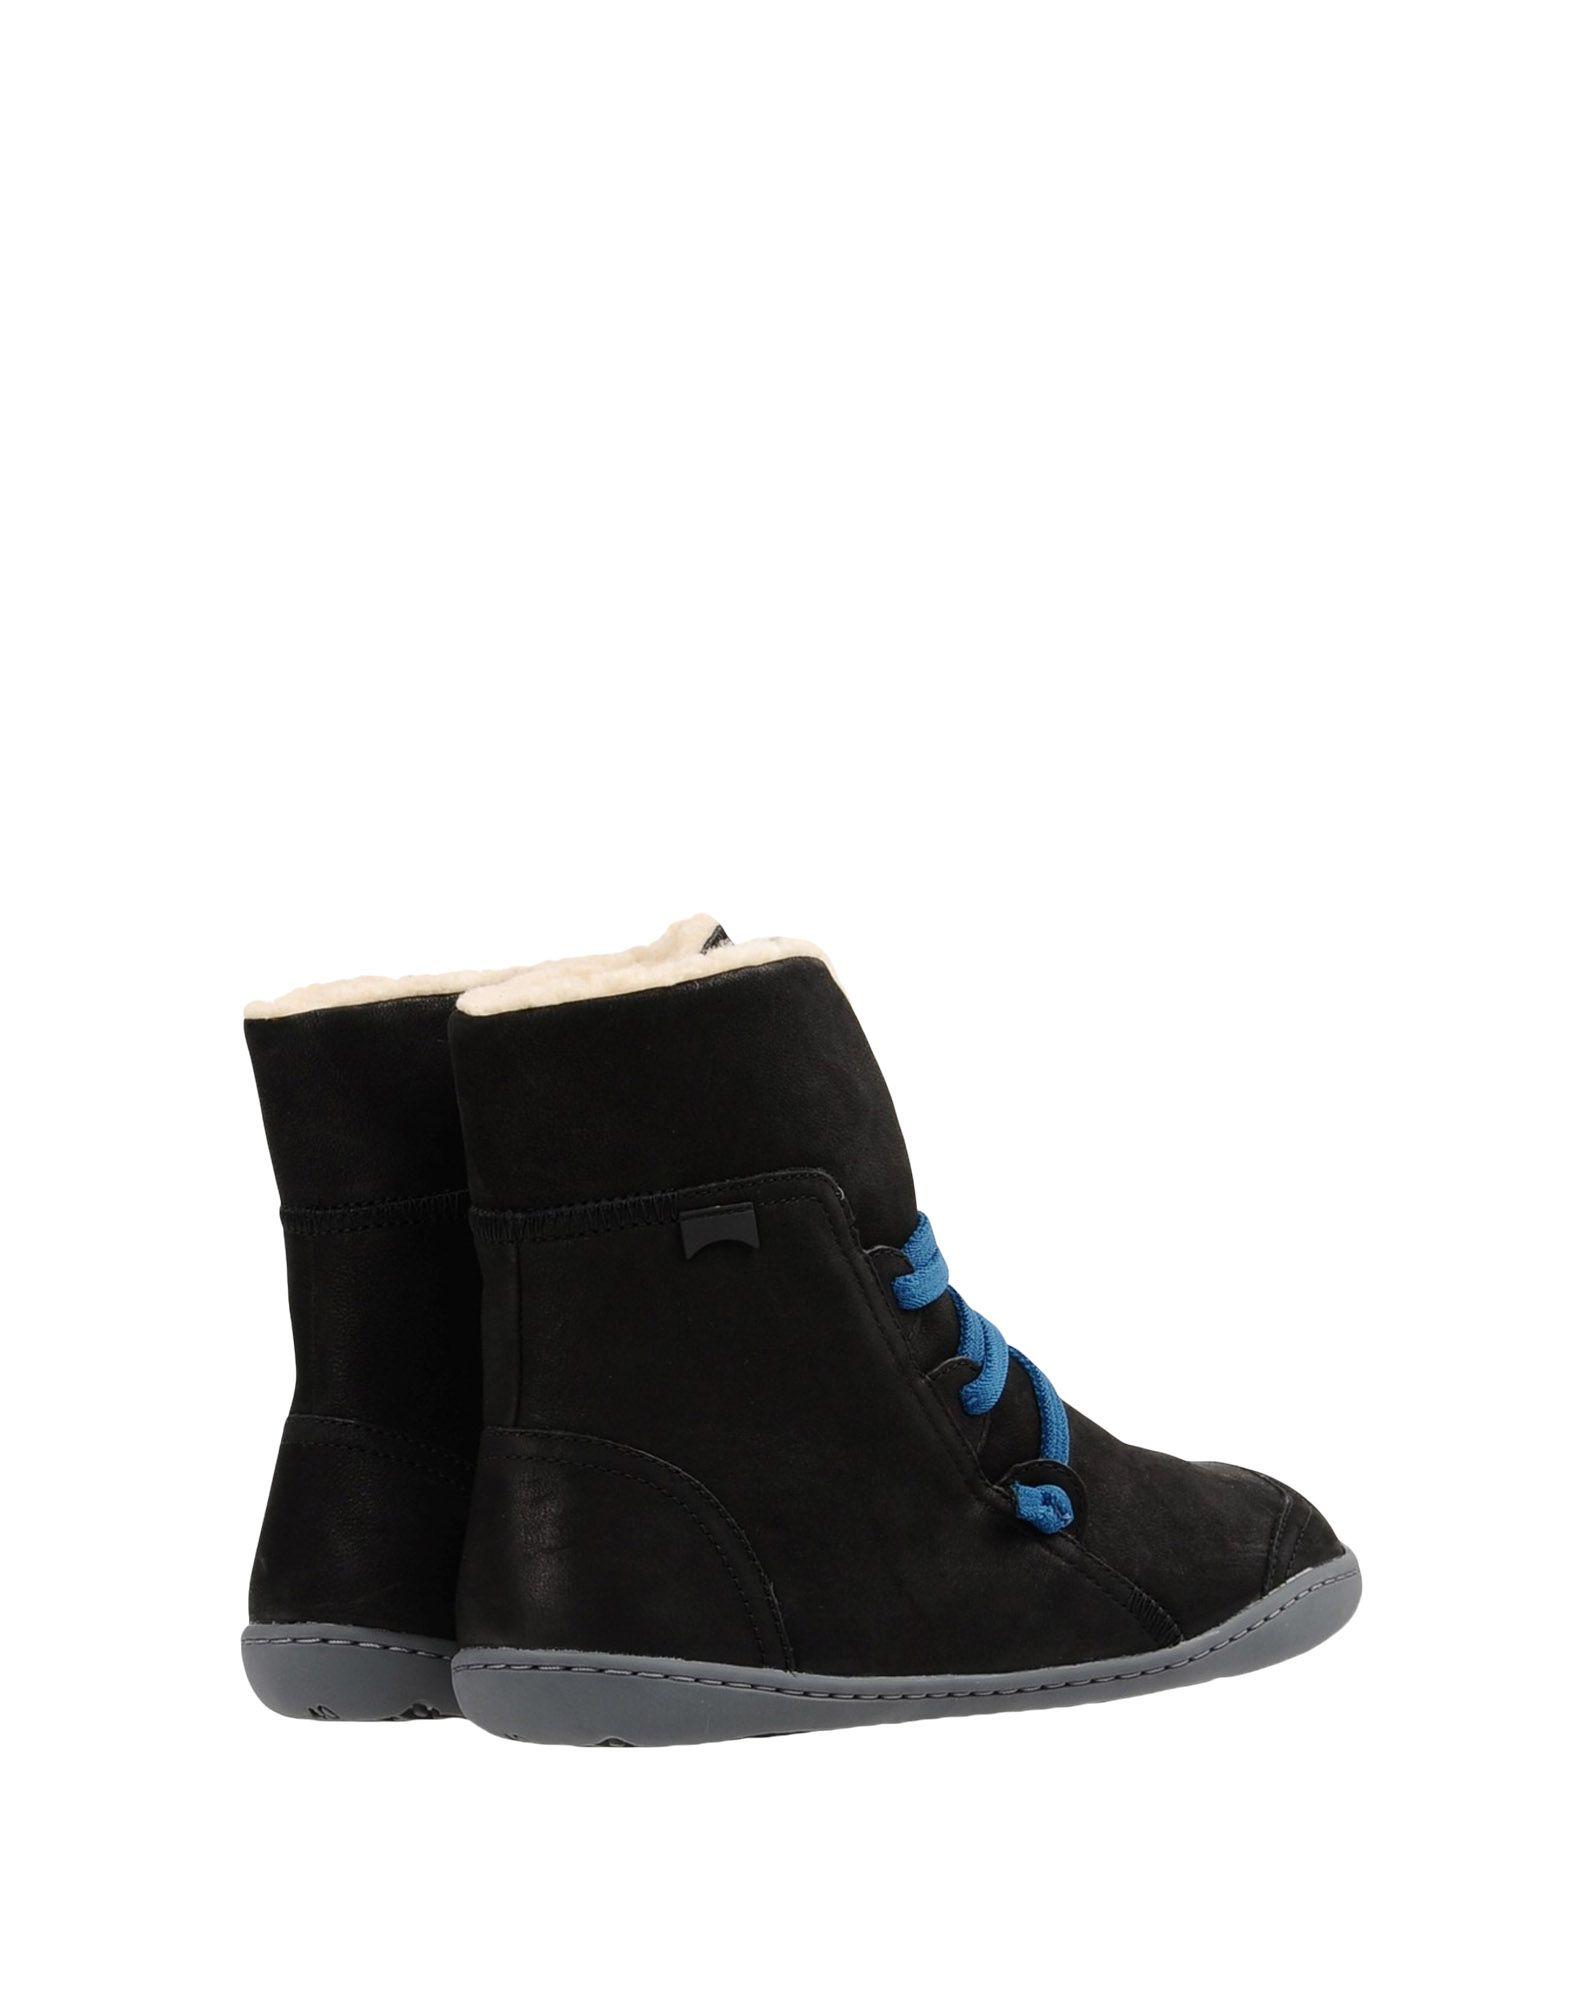 Stilvolle billige Schuhe Camper Stiefelette Damen  11356983FP